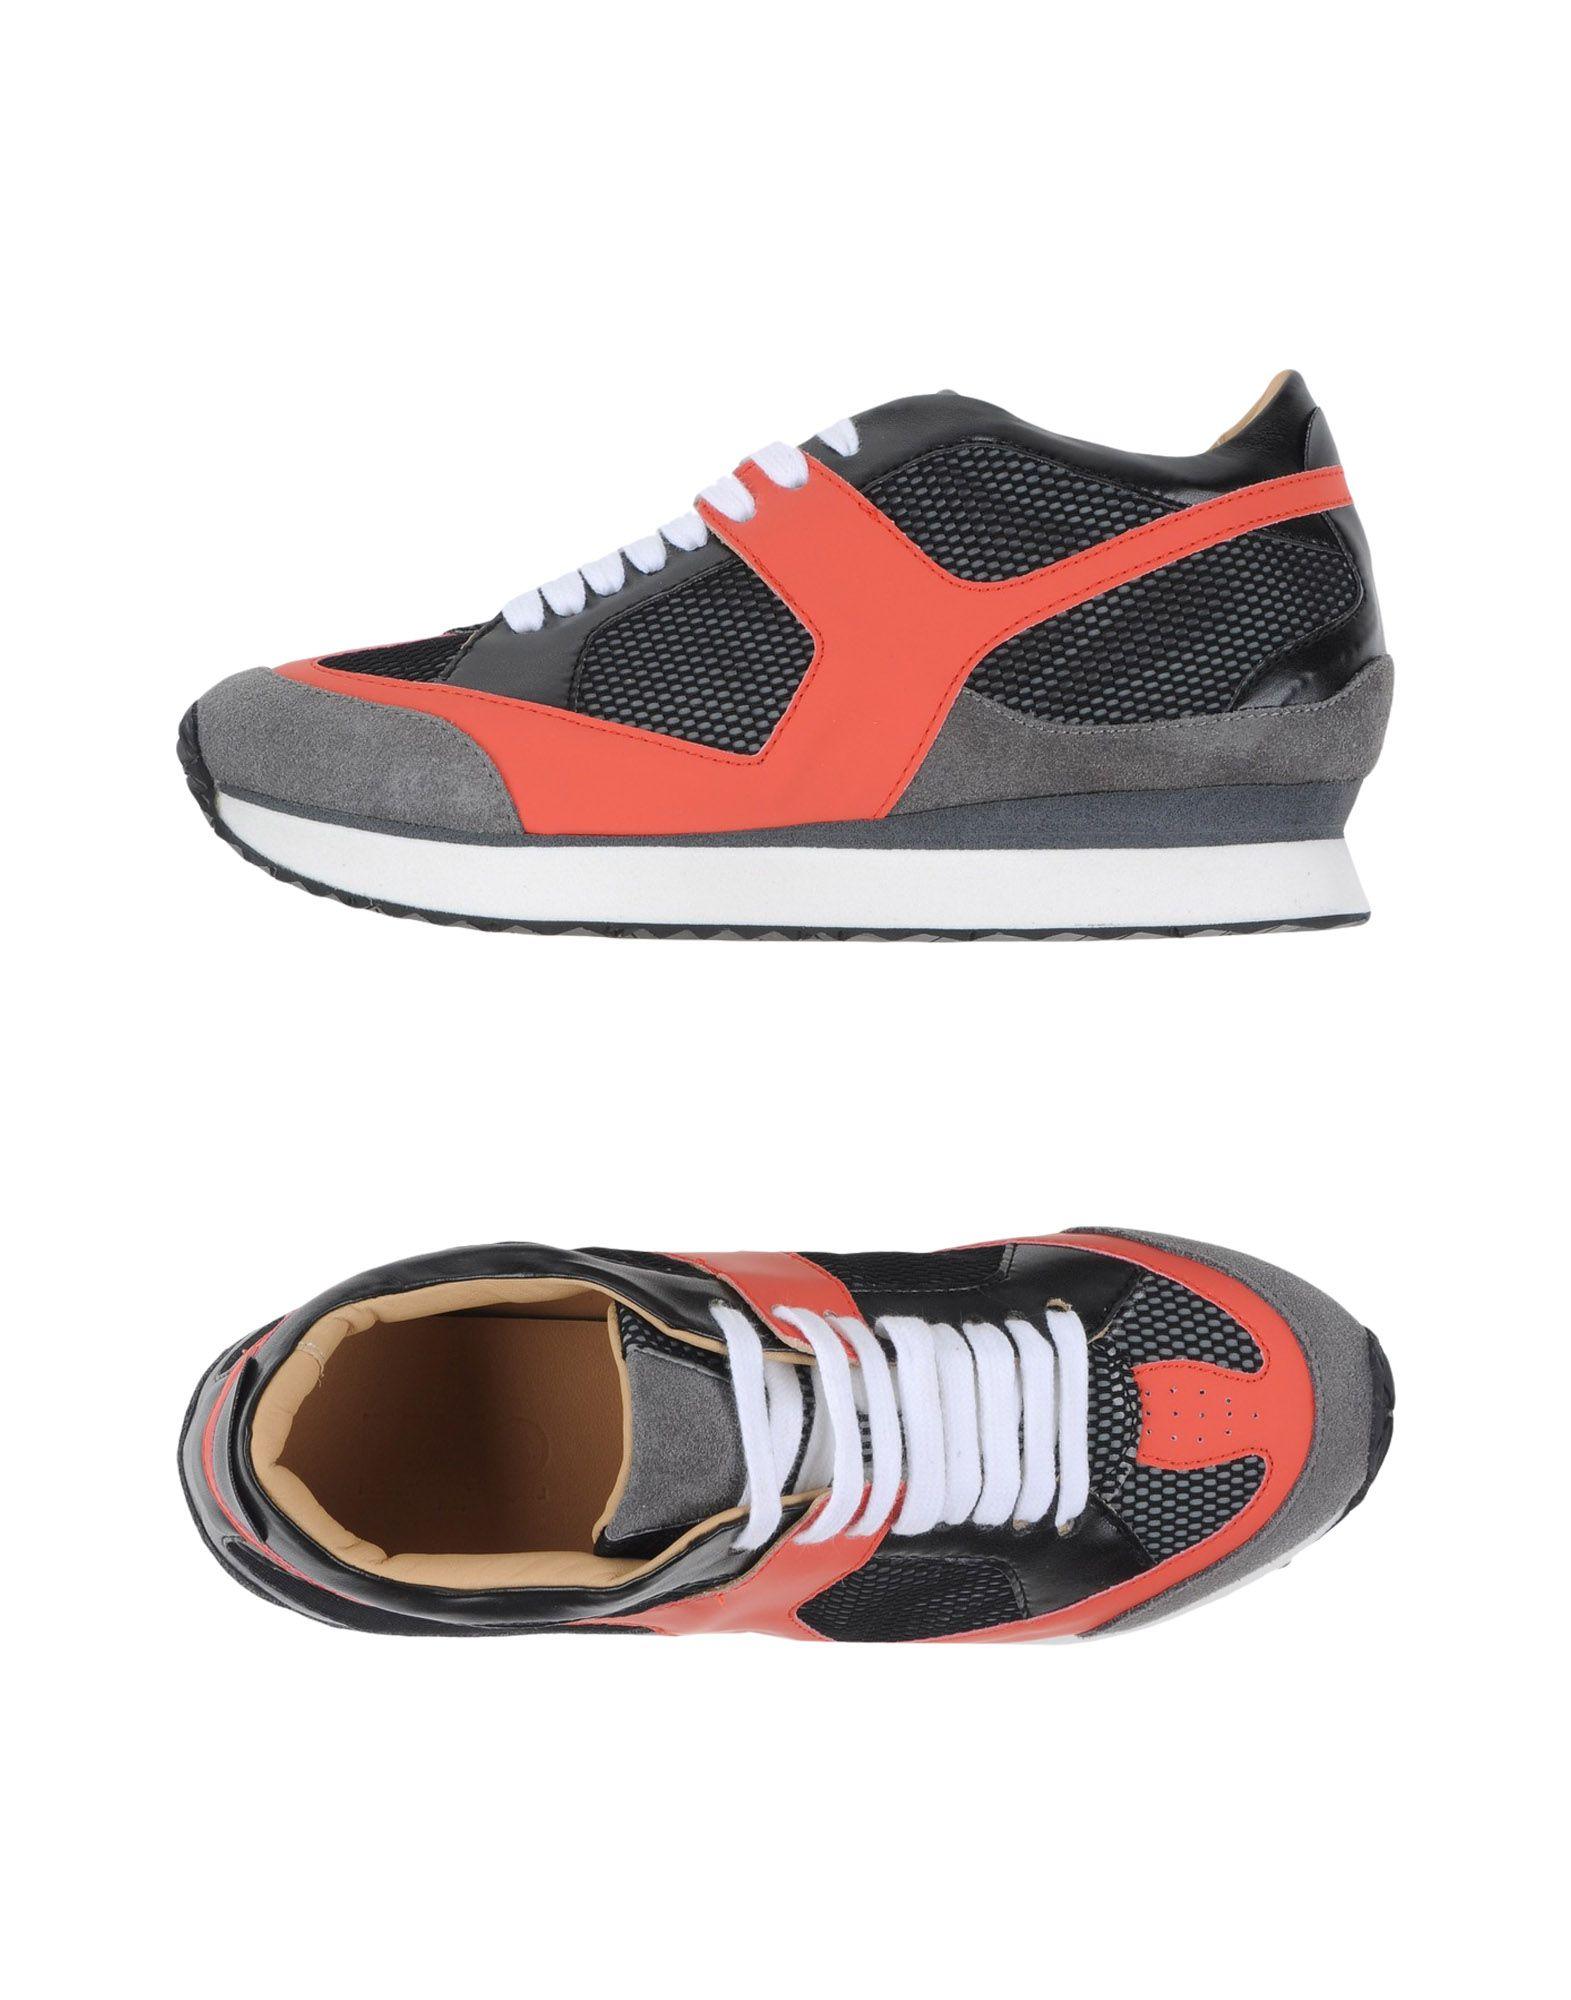 Mm6 Maison Sneakers Margiela Sneakers Maison Damen  44914973TU Neue Schuhe 0d06ff